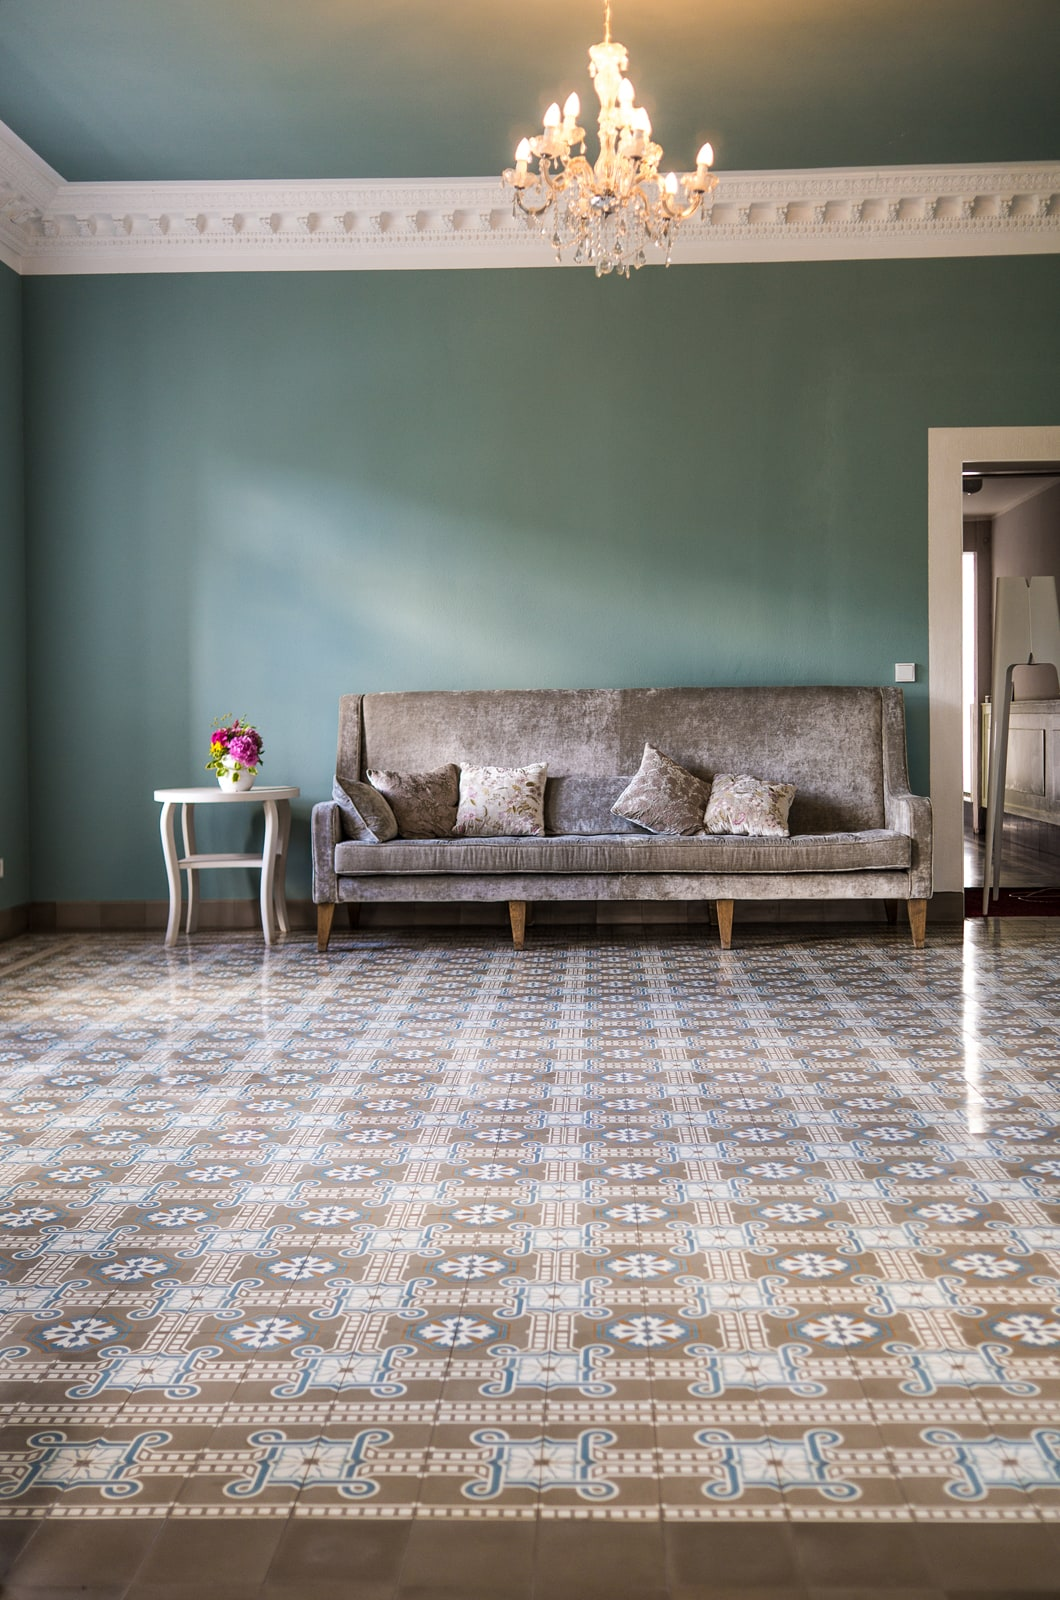 zementfliesen-terrazzofliesen-kreidefarbe-blauer-salon-308-terrazzo-fugenlos-viaplatten | Kreidefarbe Blauer Salon 2500 ml